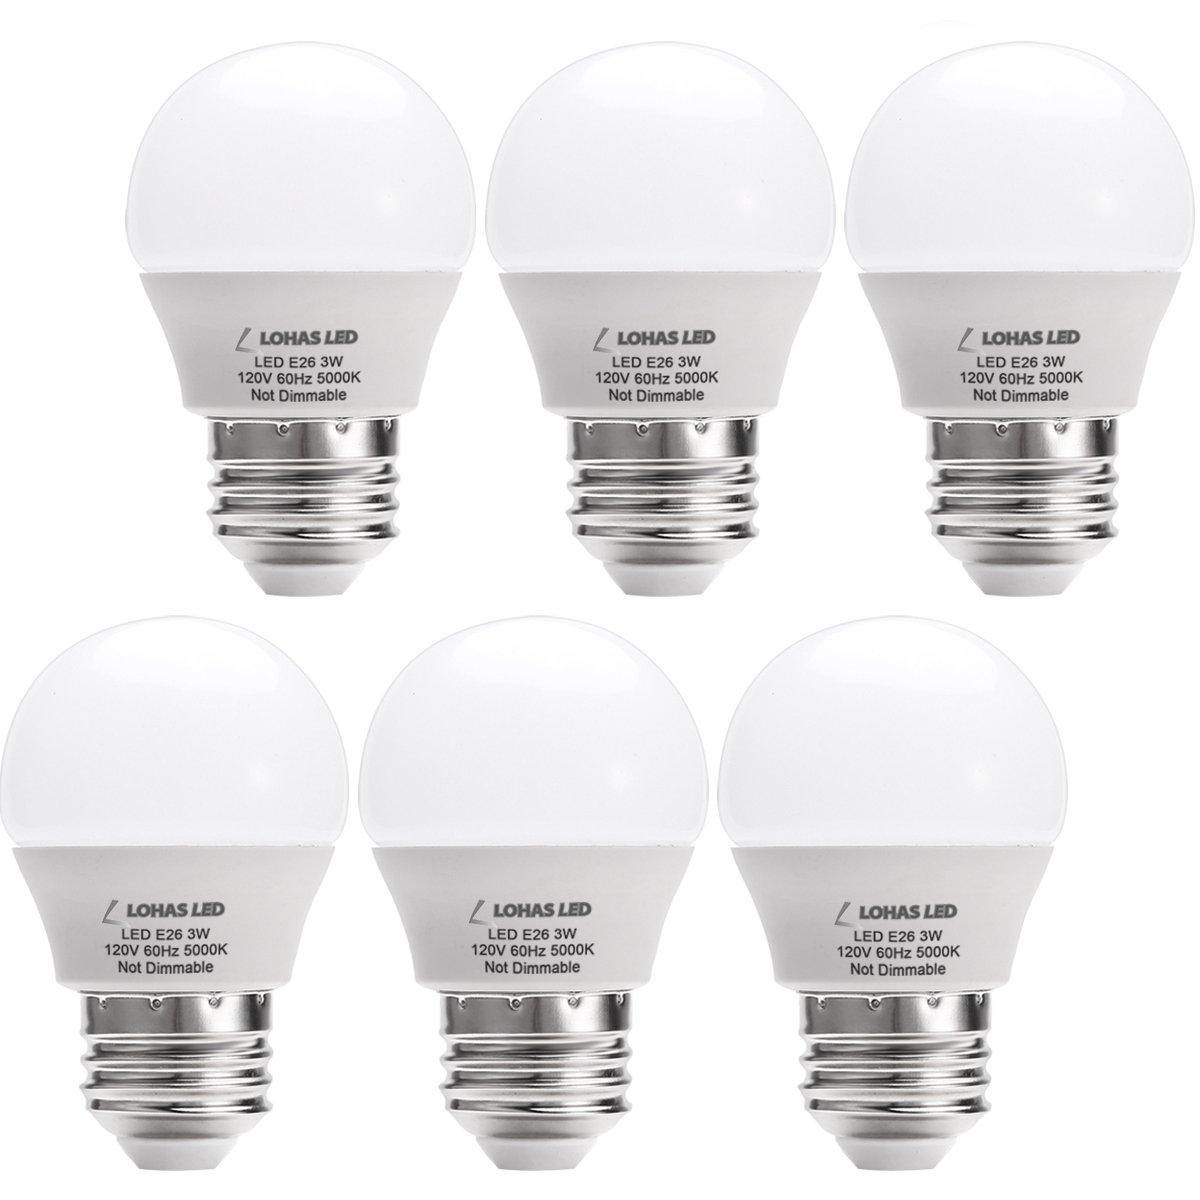 Standard Base Led Light Bulbs The Color Base Led Light Bulbs What Are Led Lights Sunlite T10